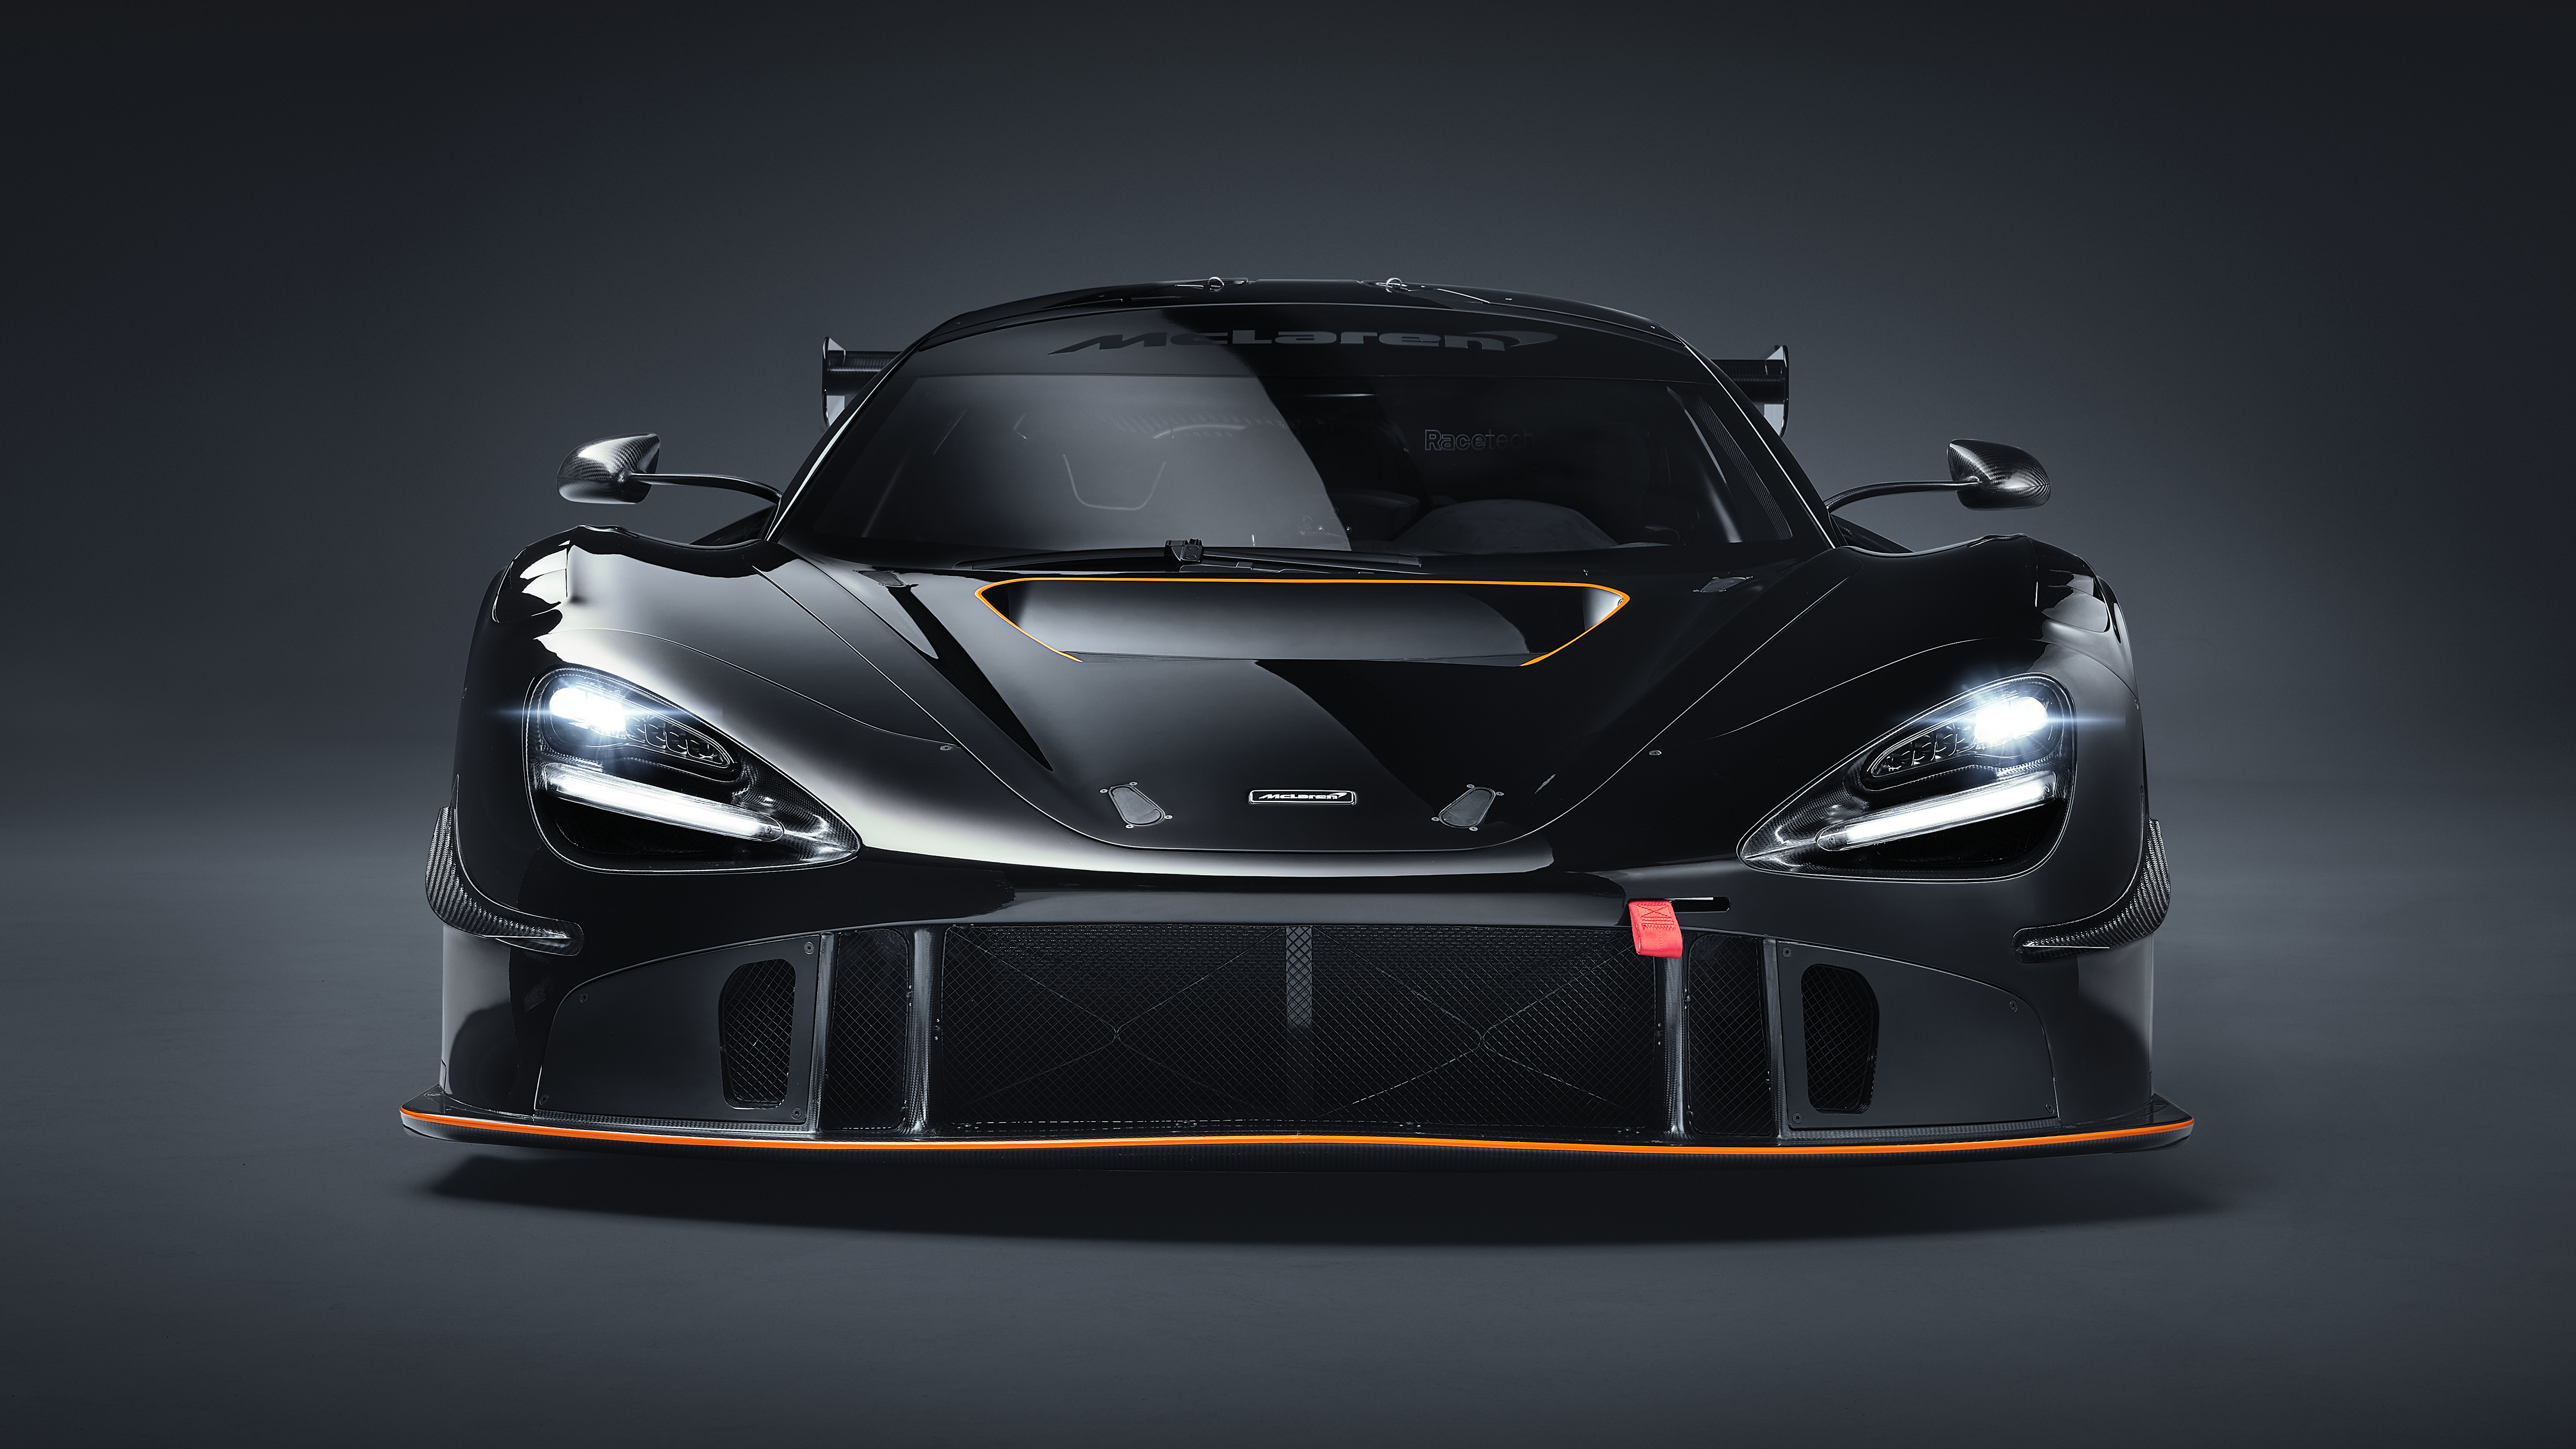 McLaren 720S McLaren Supercars Car Vehicle Black Cars Race Cars Gray Background 5120x2880